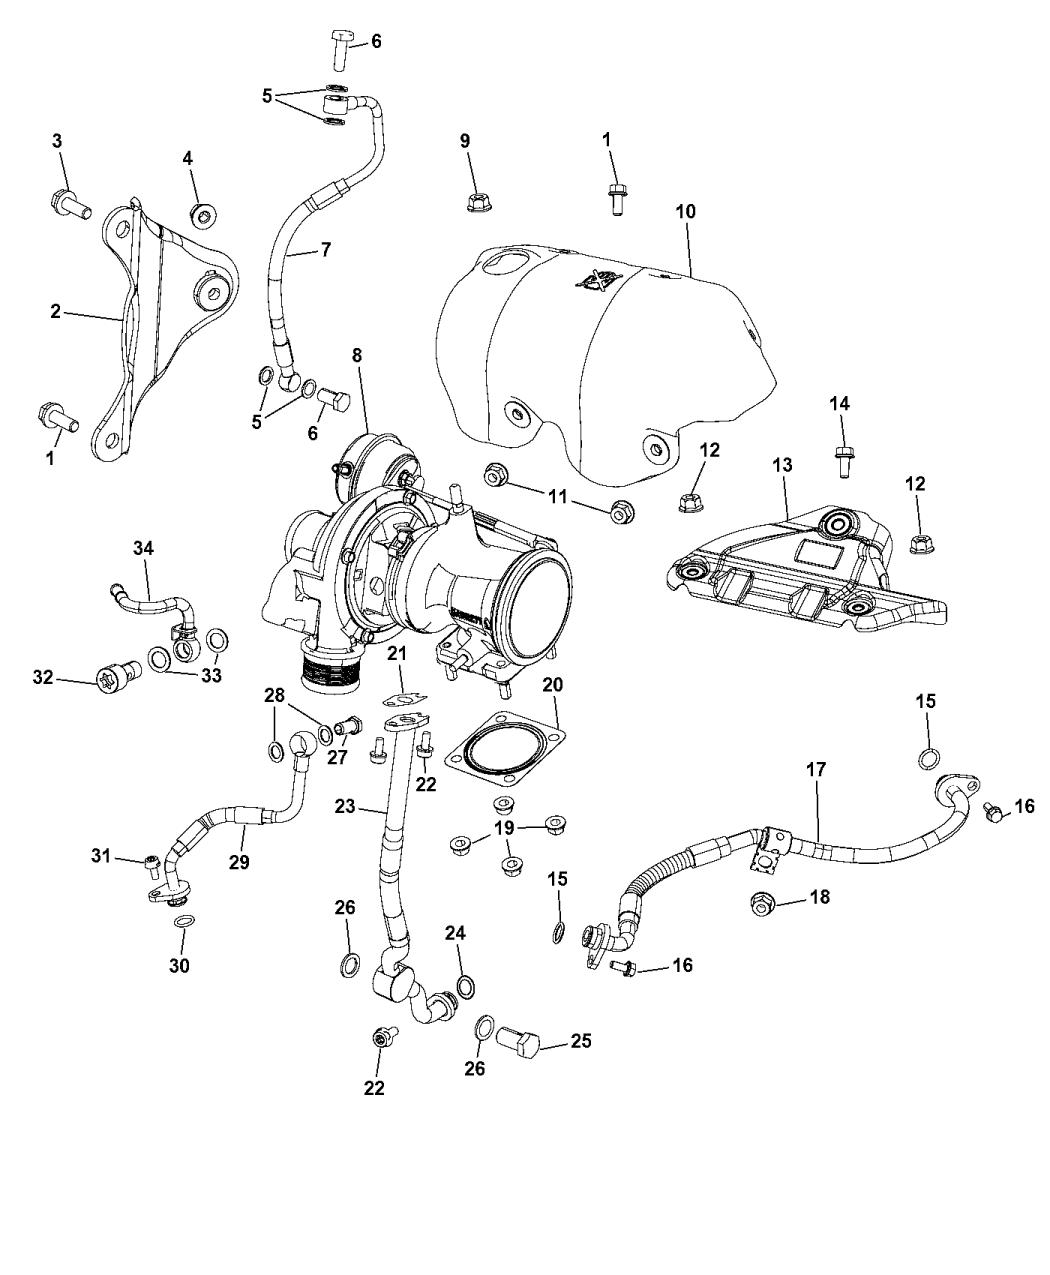 2013 dodge dart turbocharger \u0026 oil hoses tubesDodge Dart 2 0 Engine Diagram #15